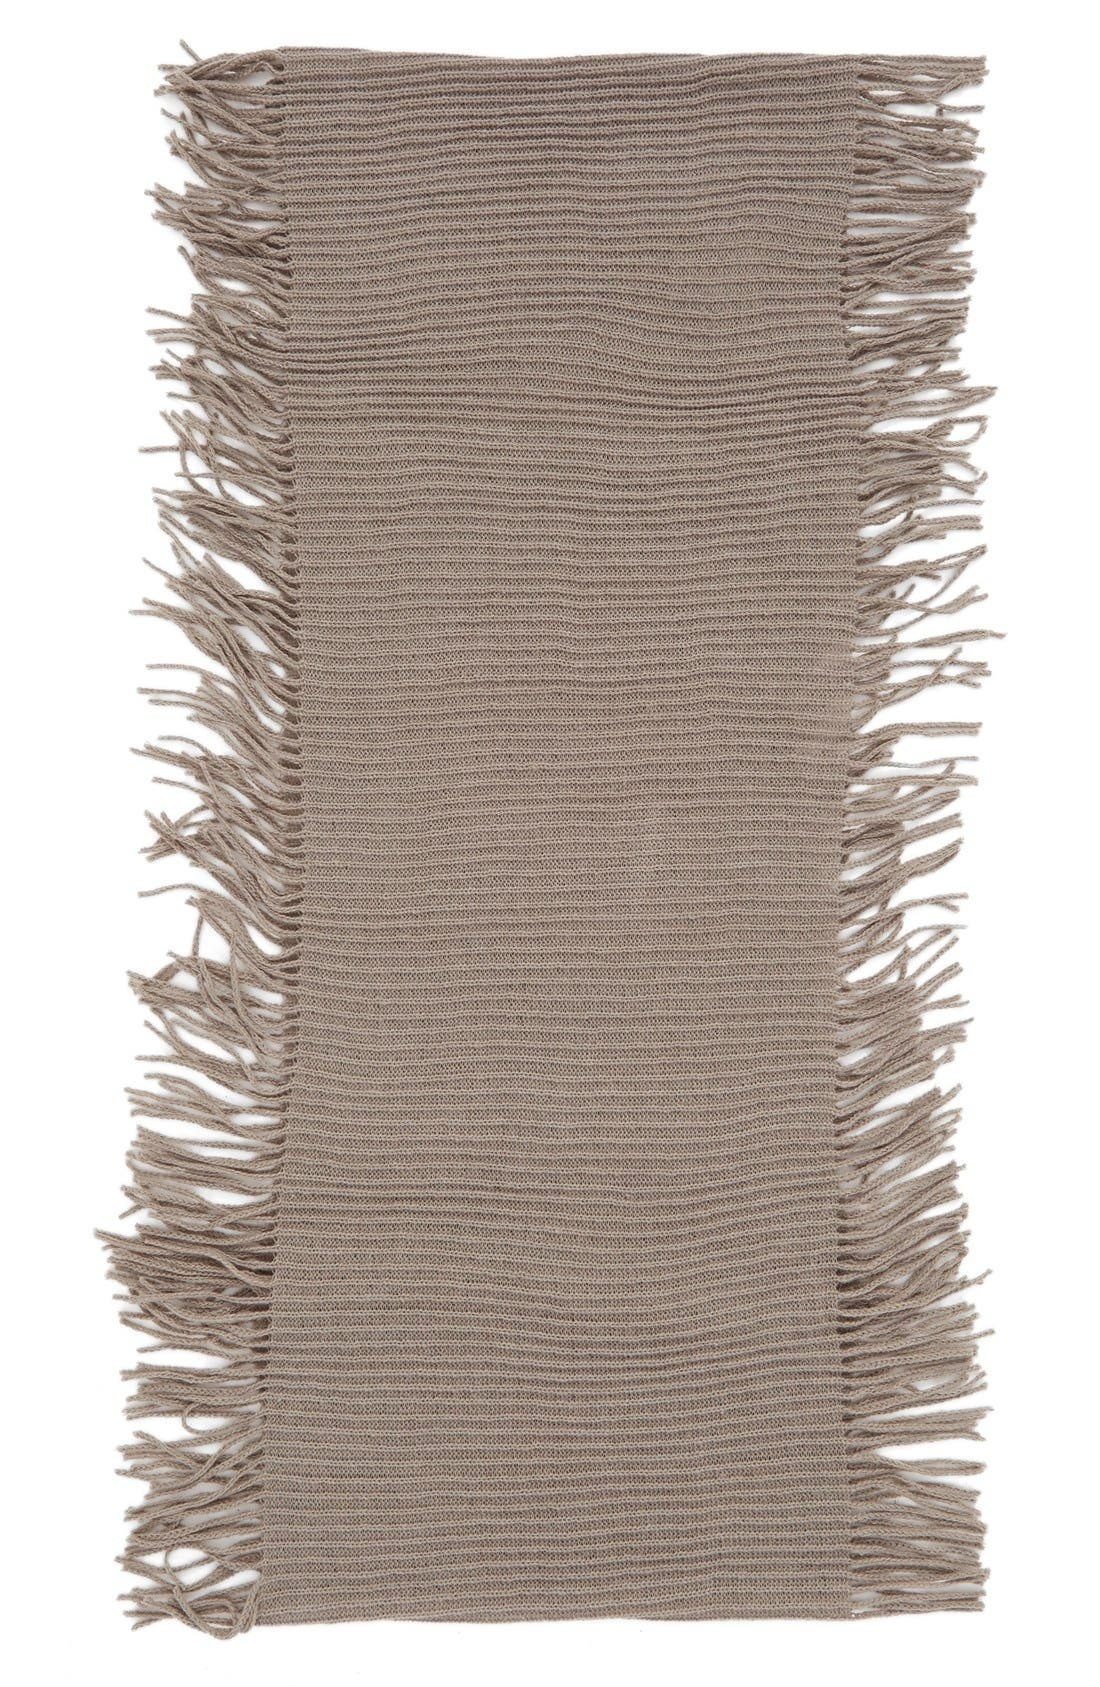 Rib Knit Fringe Infinity Scarf,                             Alternate thumbnail 14, color,